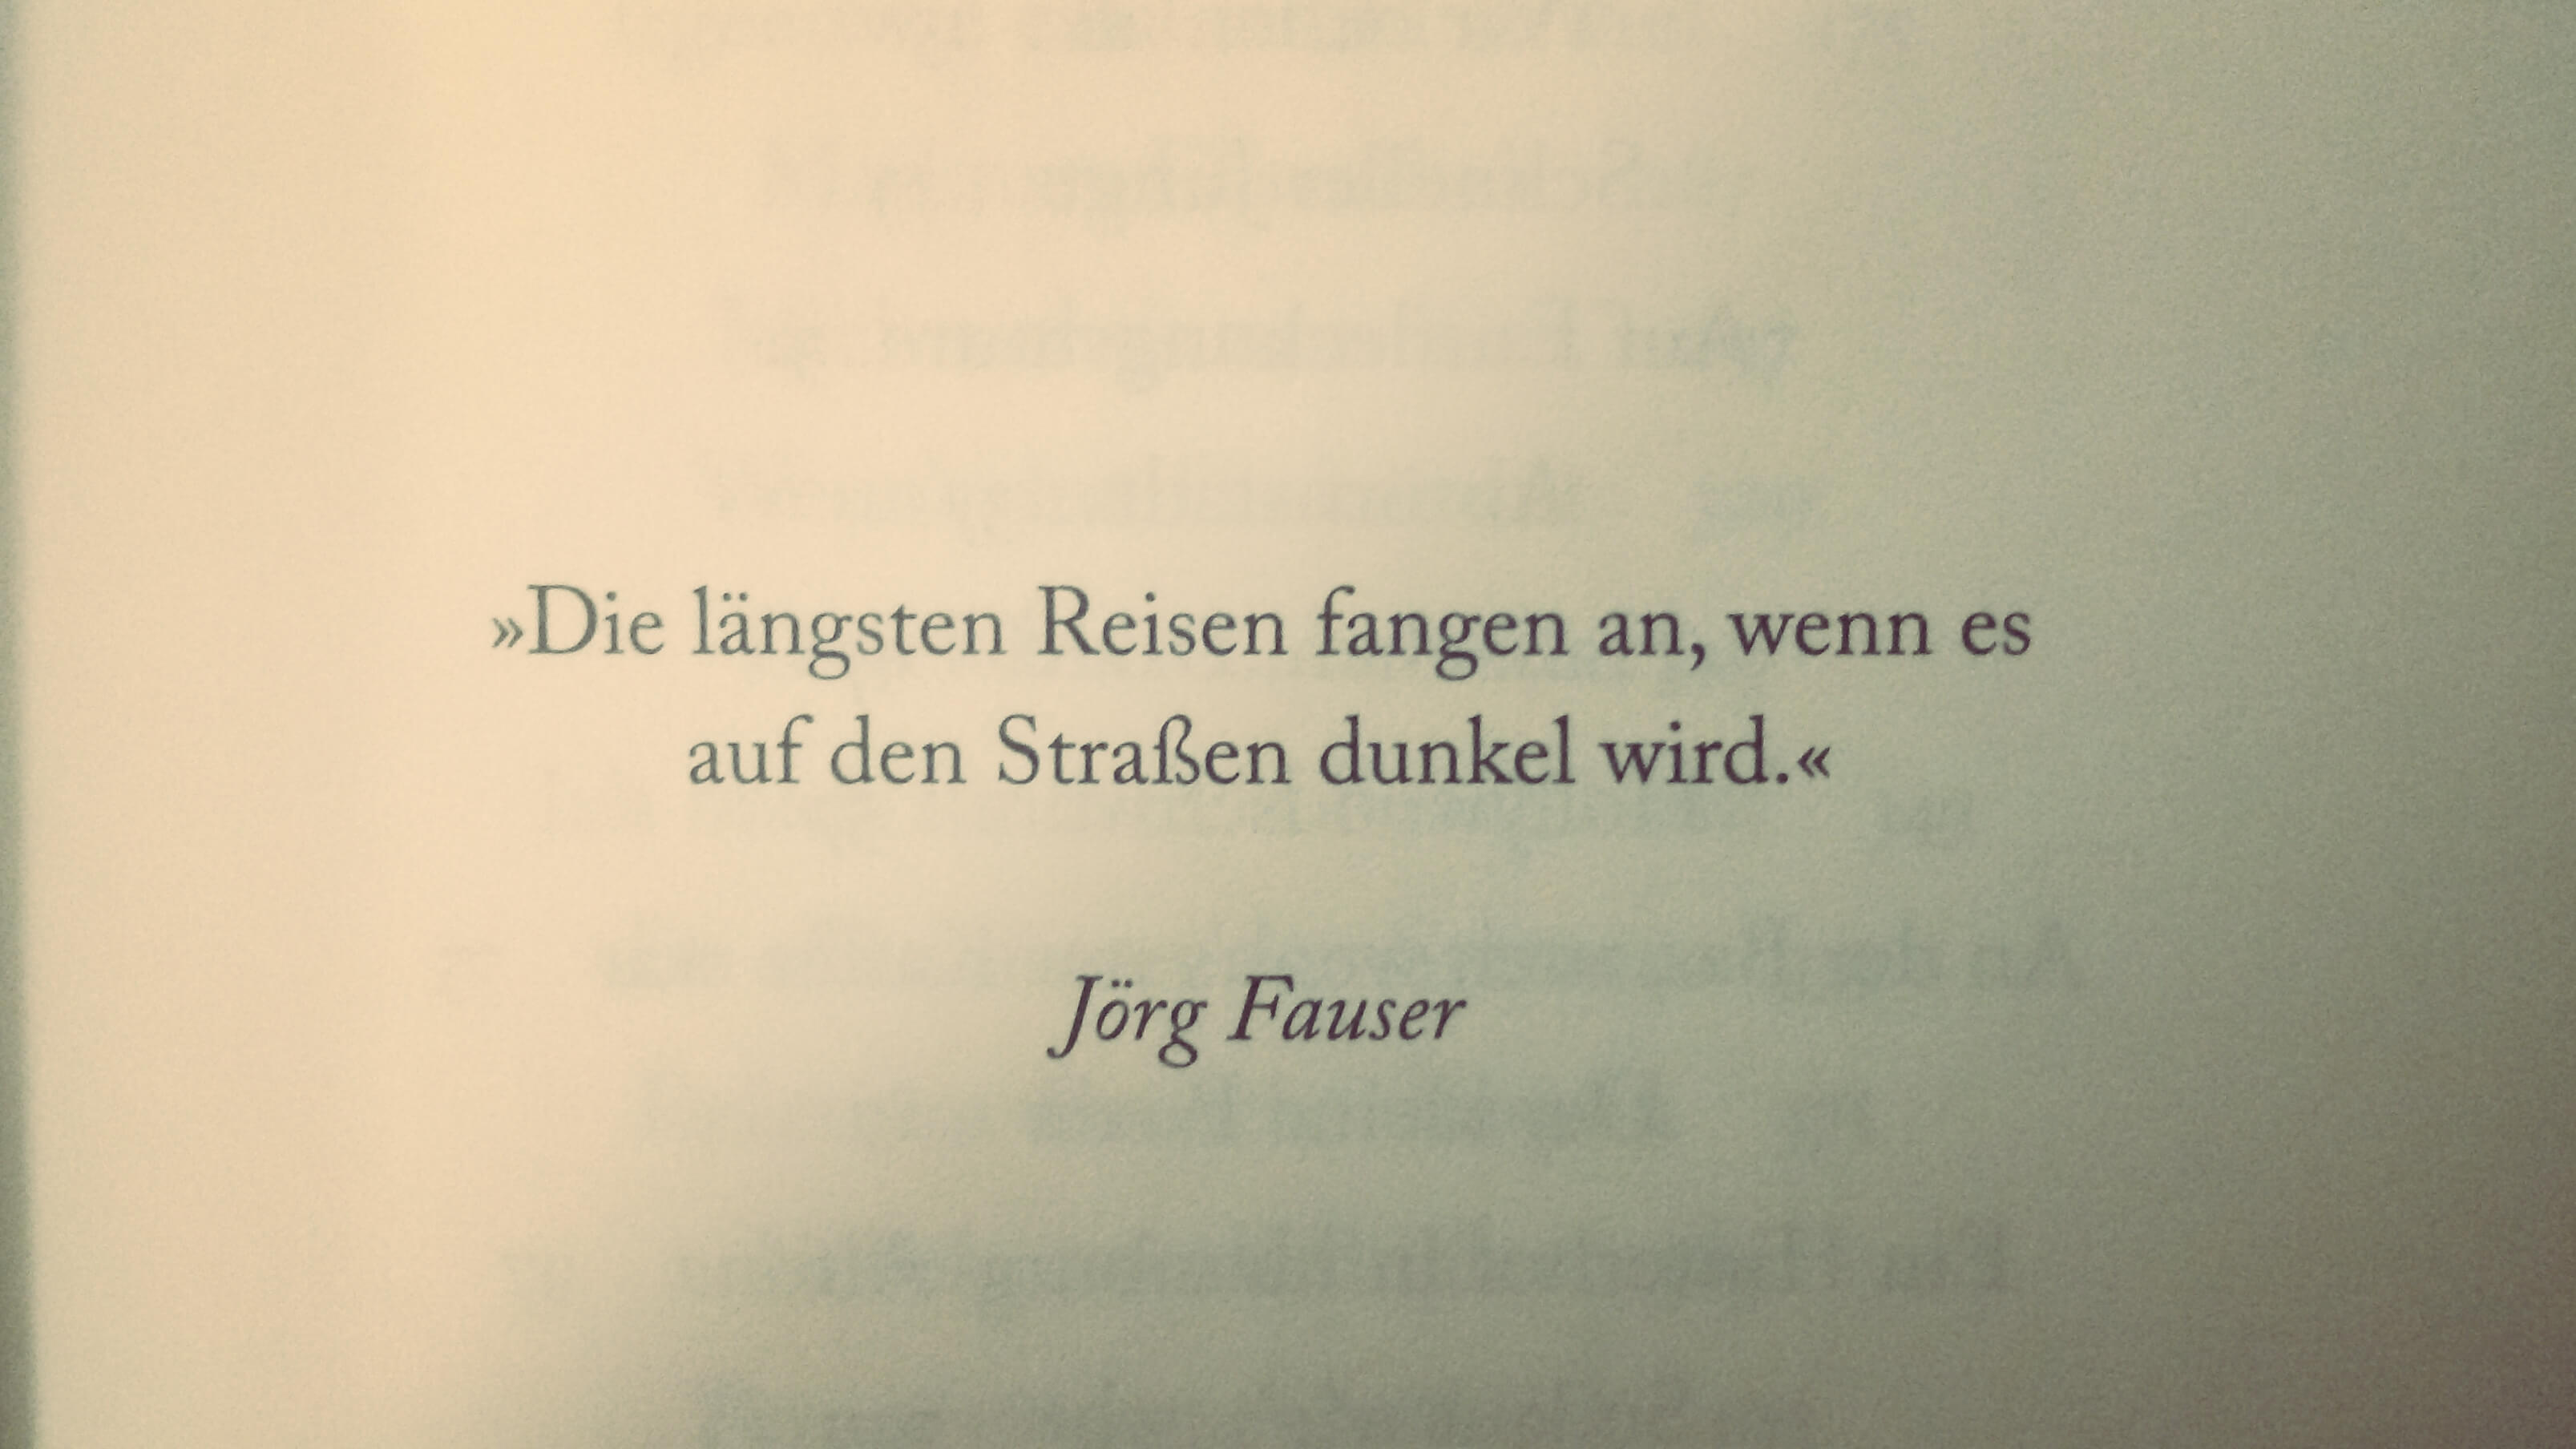 Jörg Fauser